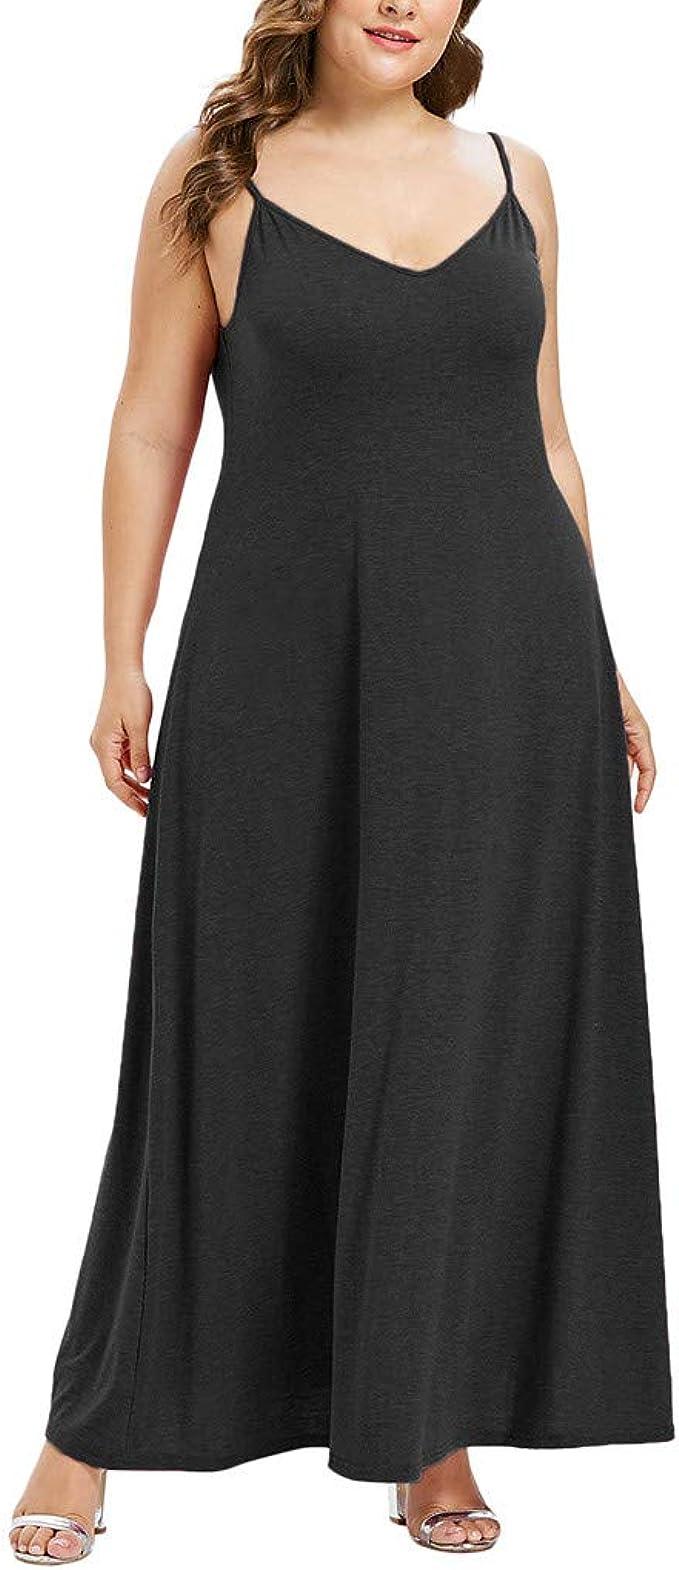 Womens Plain Sleeveless Ladies Scoop Neck Belted Long Maxi Vest Dress Plus Size